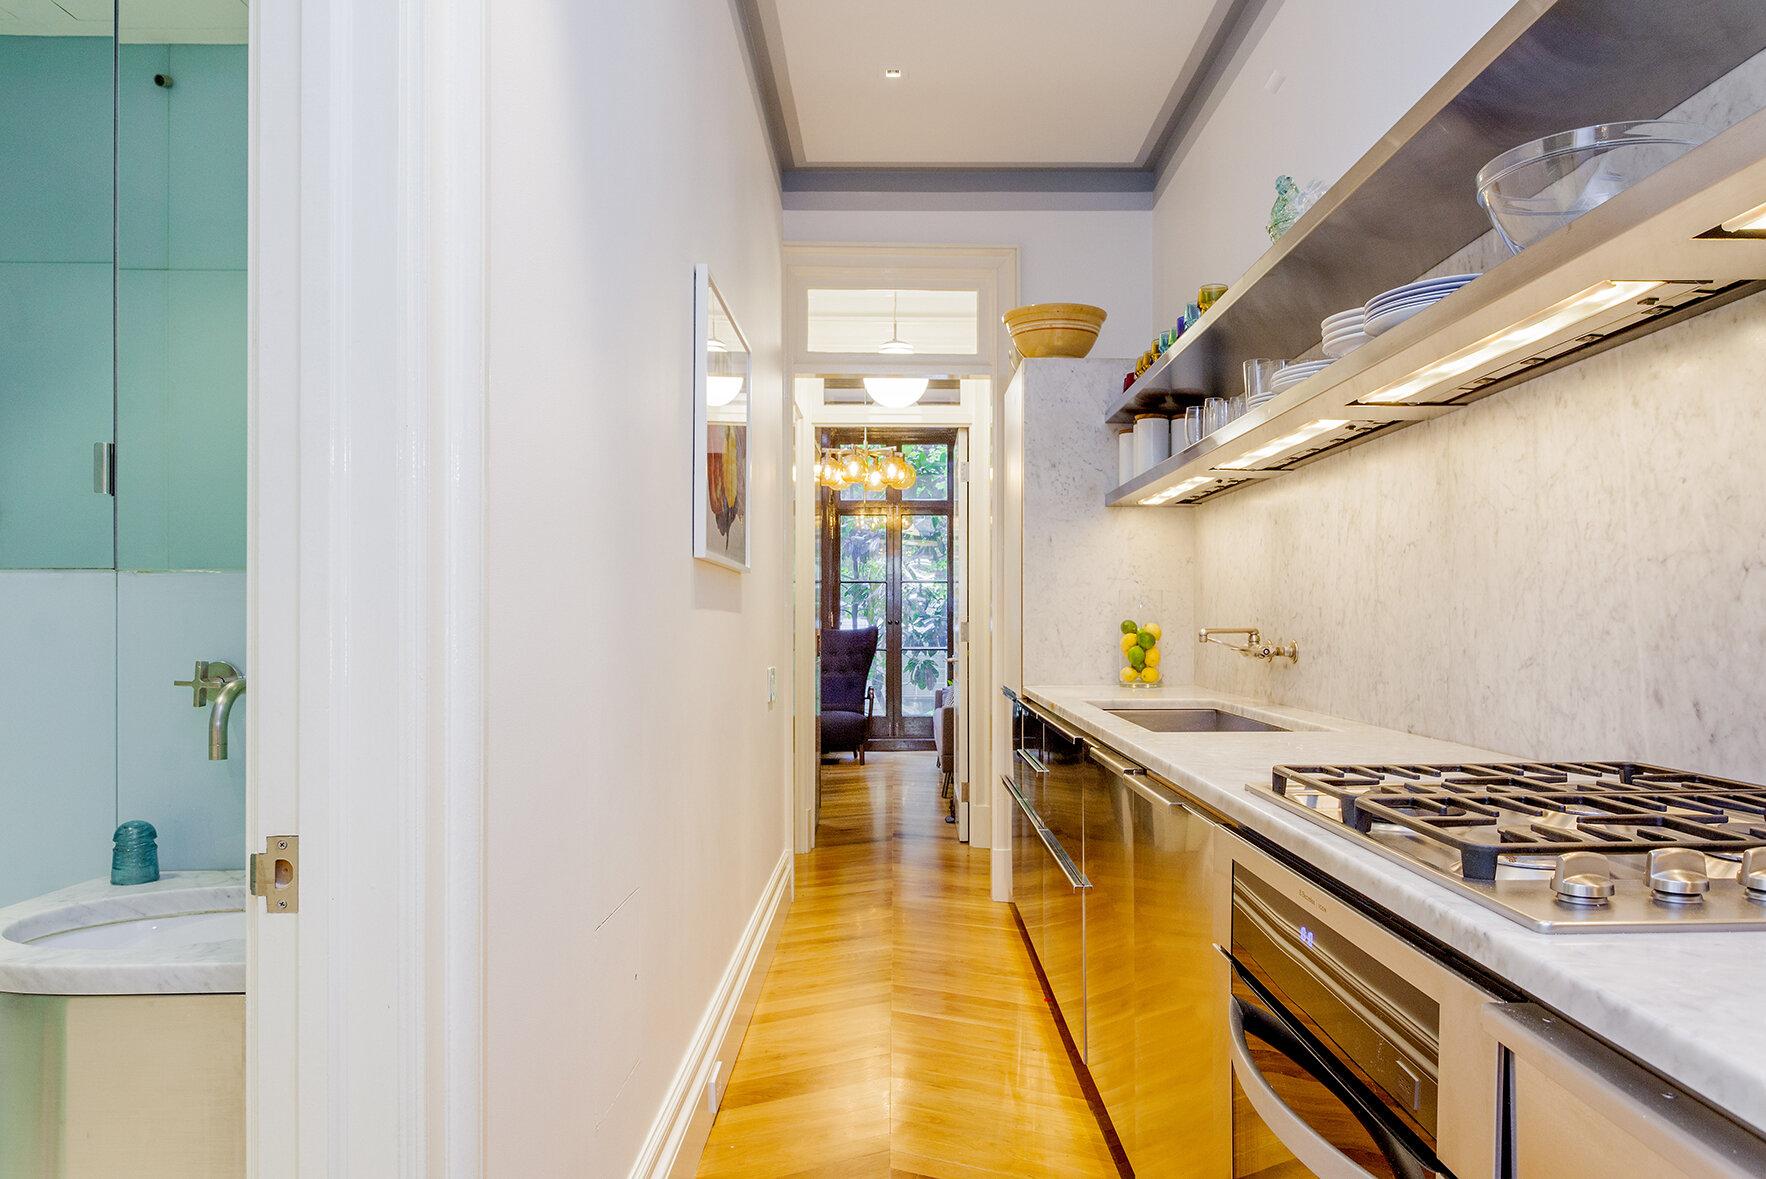 28 E 21 2A - Kitchen3LOWRES.jpg